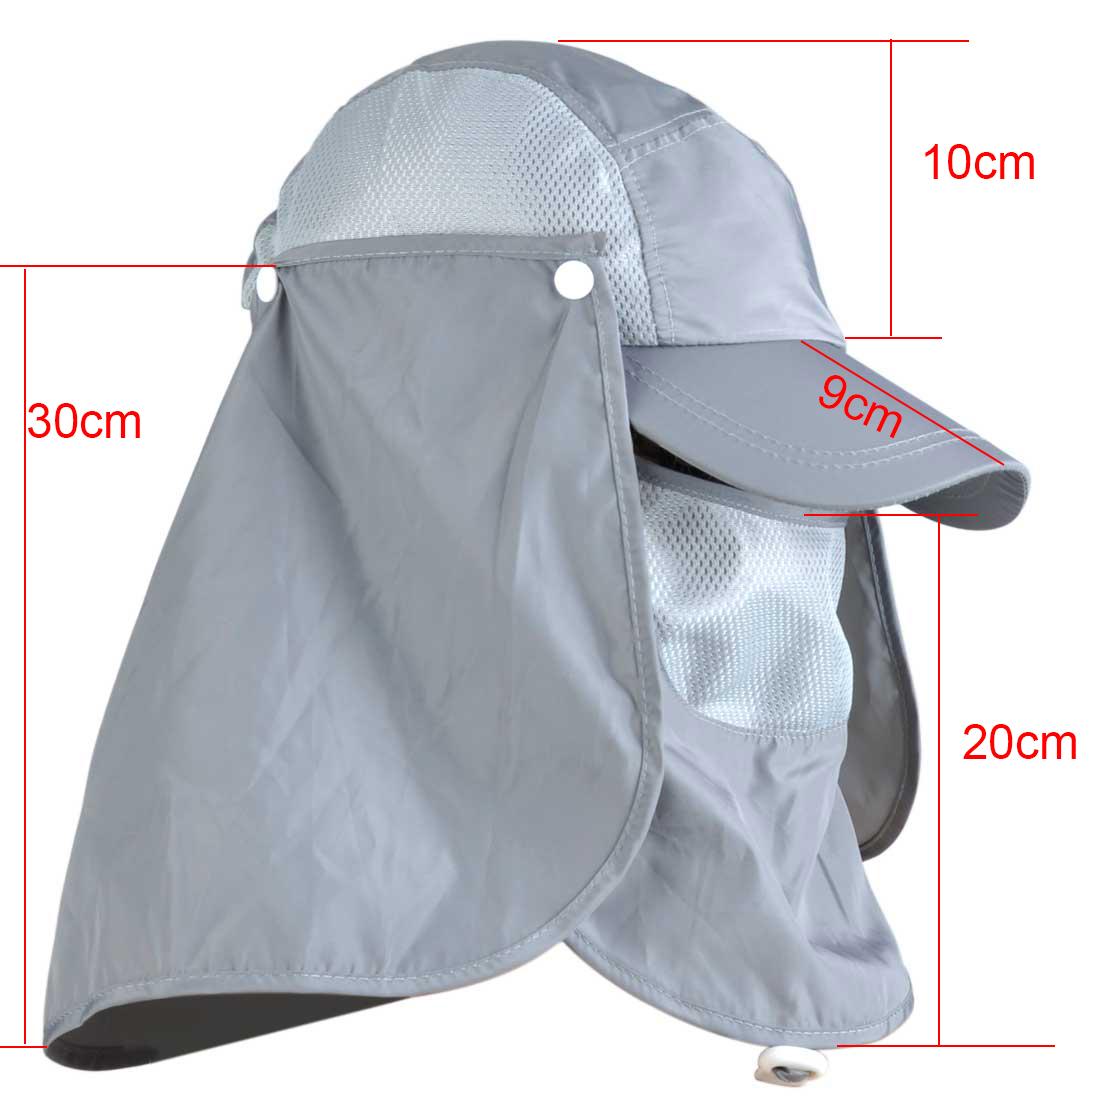 Unisex fishing hiking brim baseball cap sun uv protection for Fishing hats sun protection